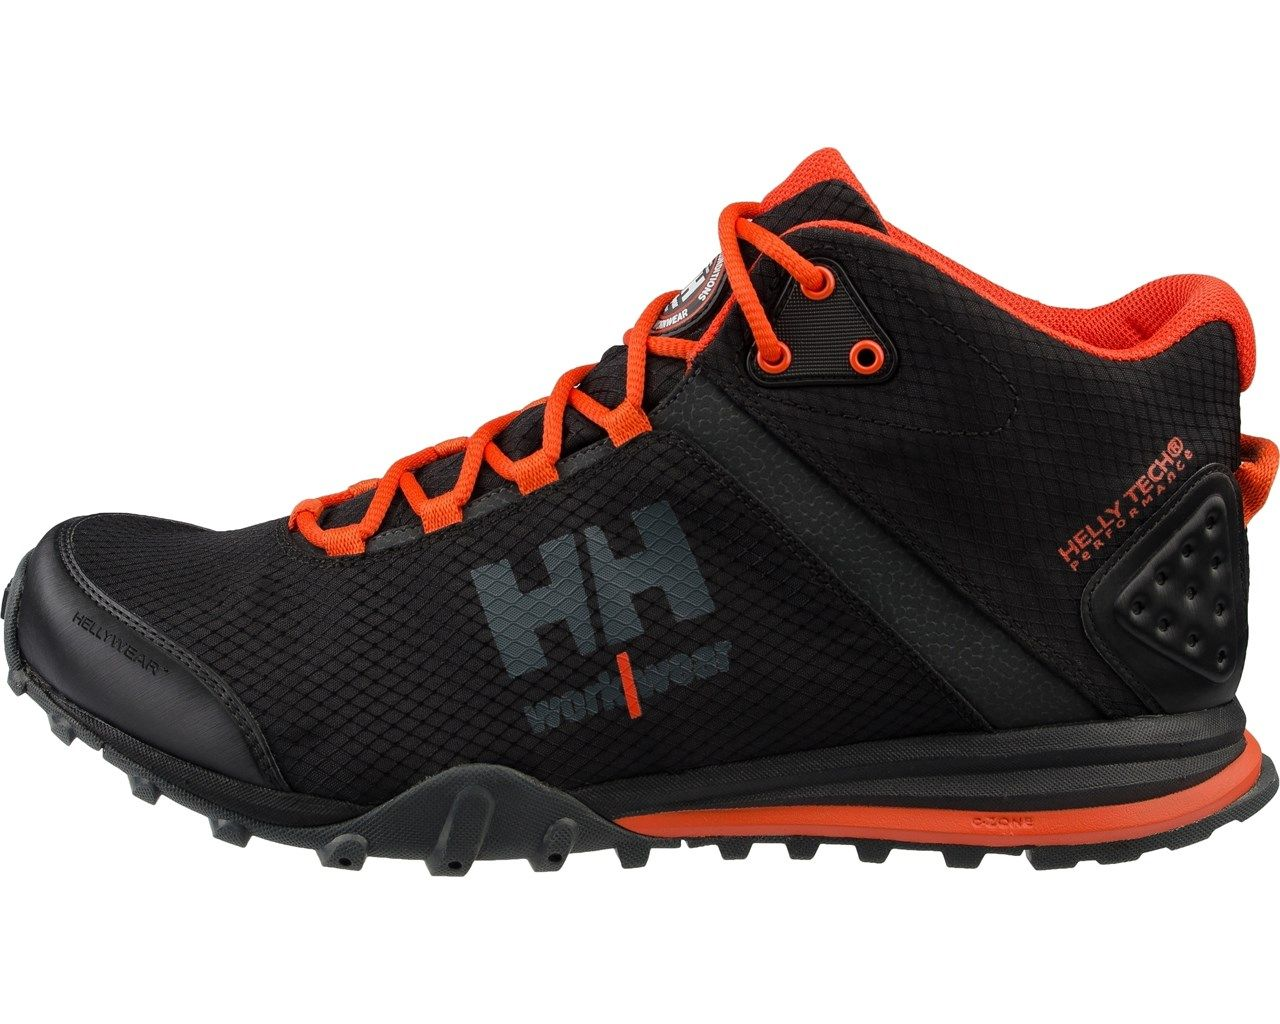 Helly Hansen Rabbora Trail Mid HT Running Shoe shoes